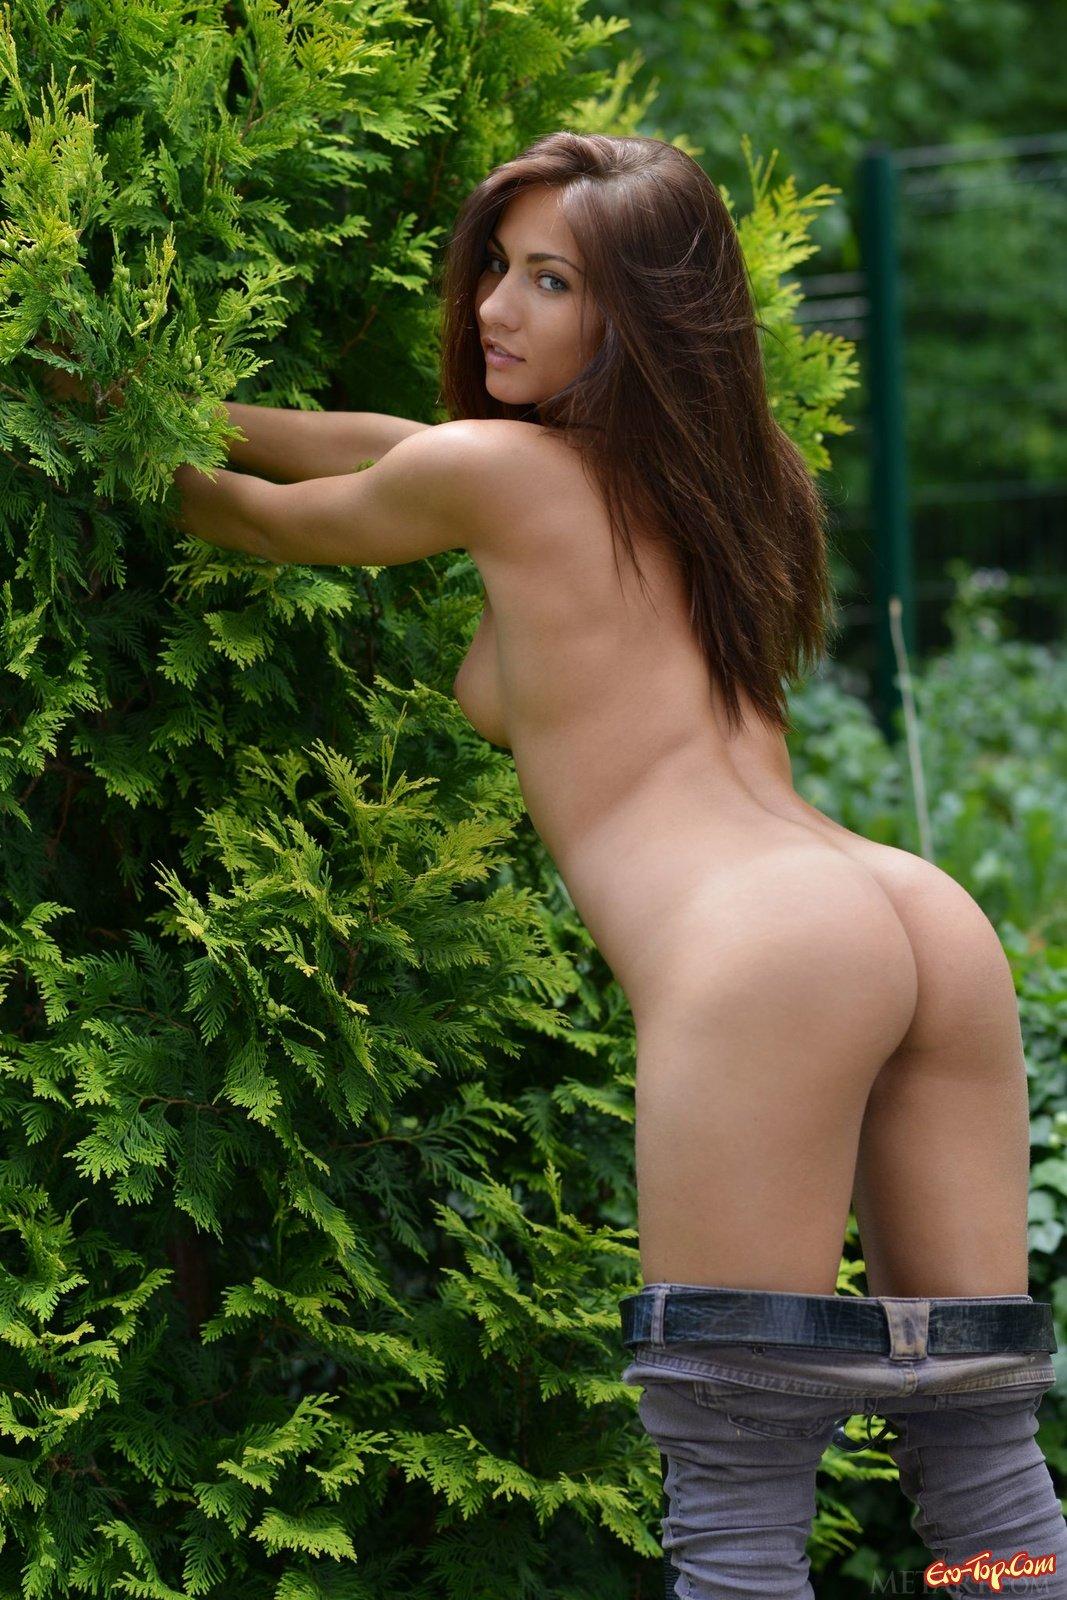 Nude attack, tumblr nude adrienne janic